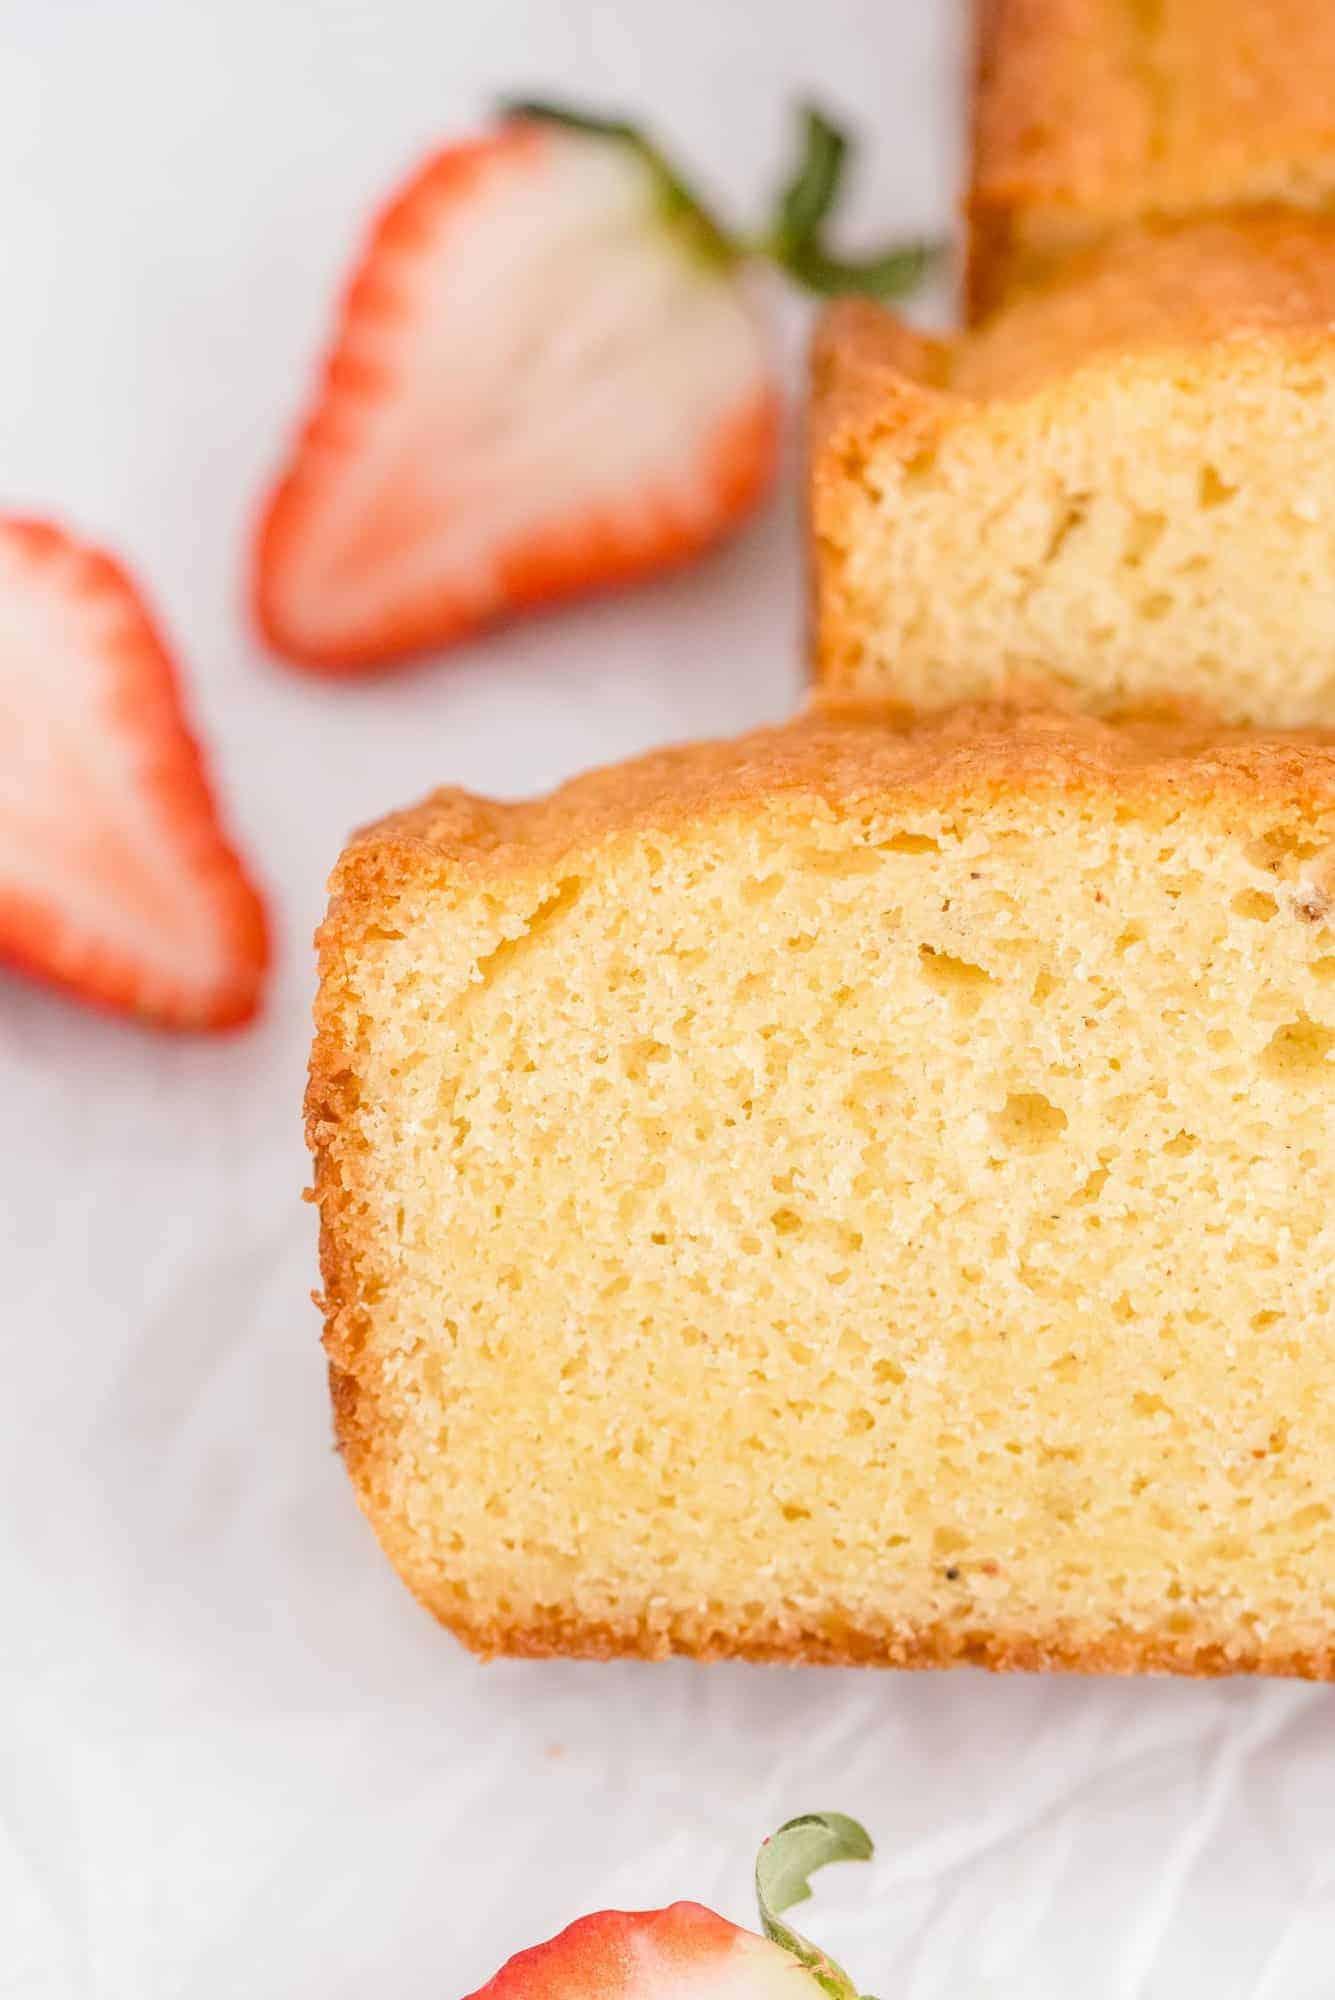 Slices of cake in a loaf format.